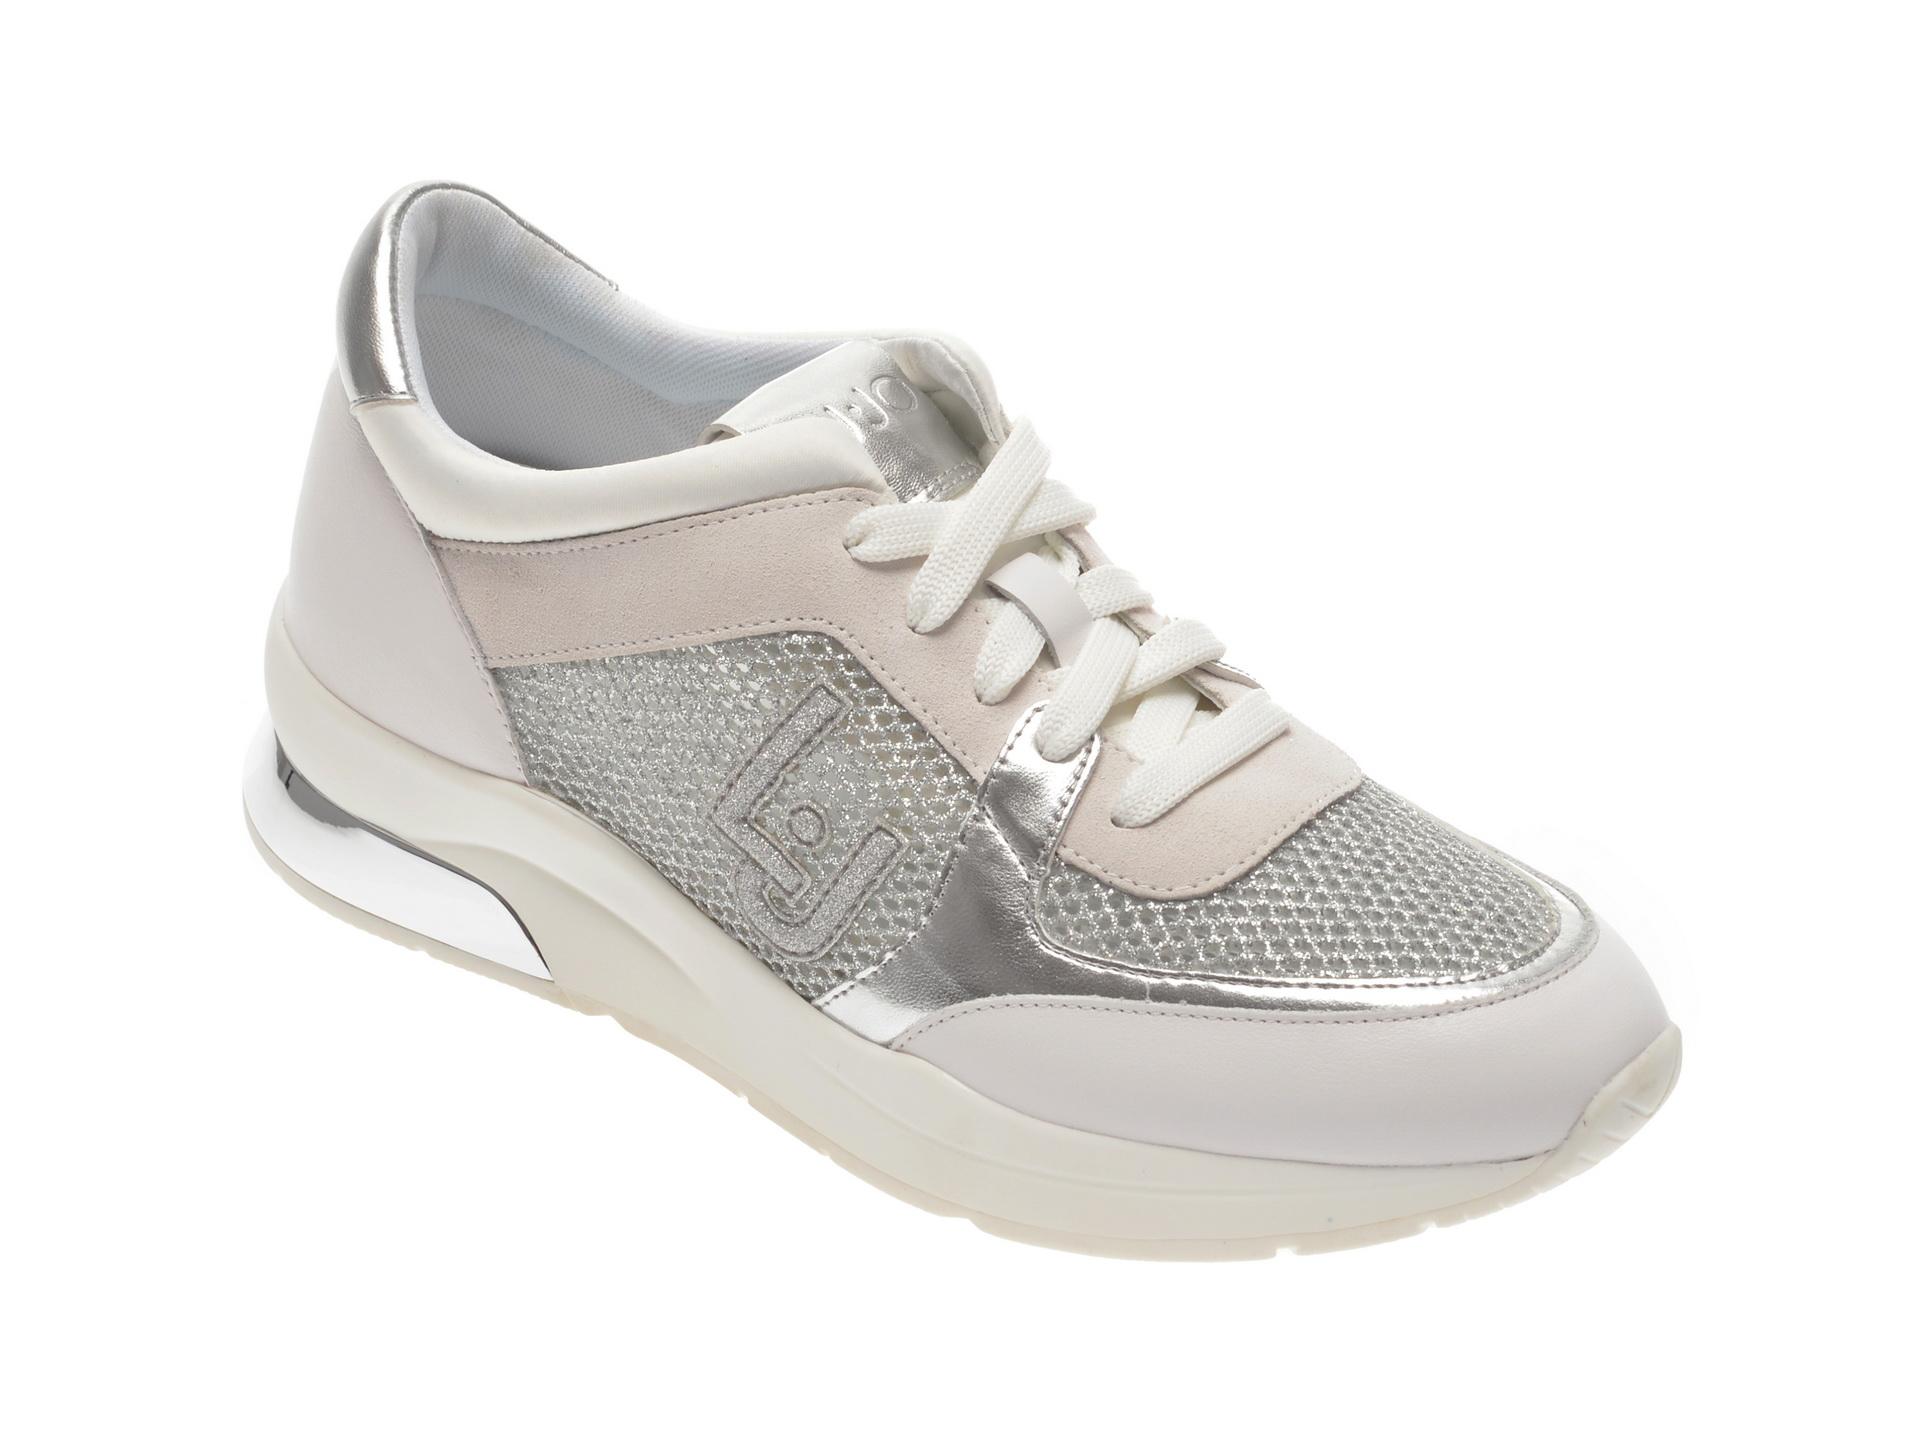 Pantofi sport LIU JO albi, KARL12, din material textil si piele ecologica